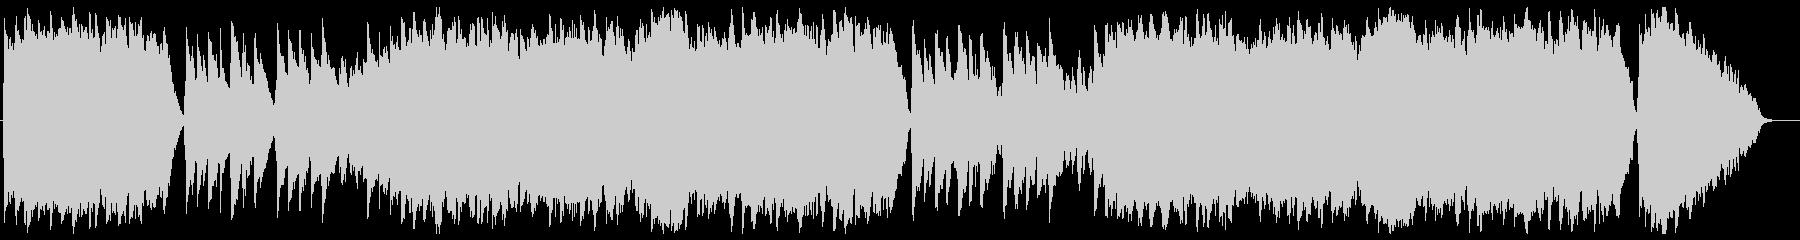 Aura Lee (Love Me Tender Original Song)'s unreproduced waveform